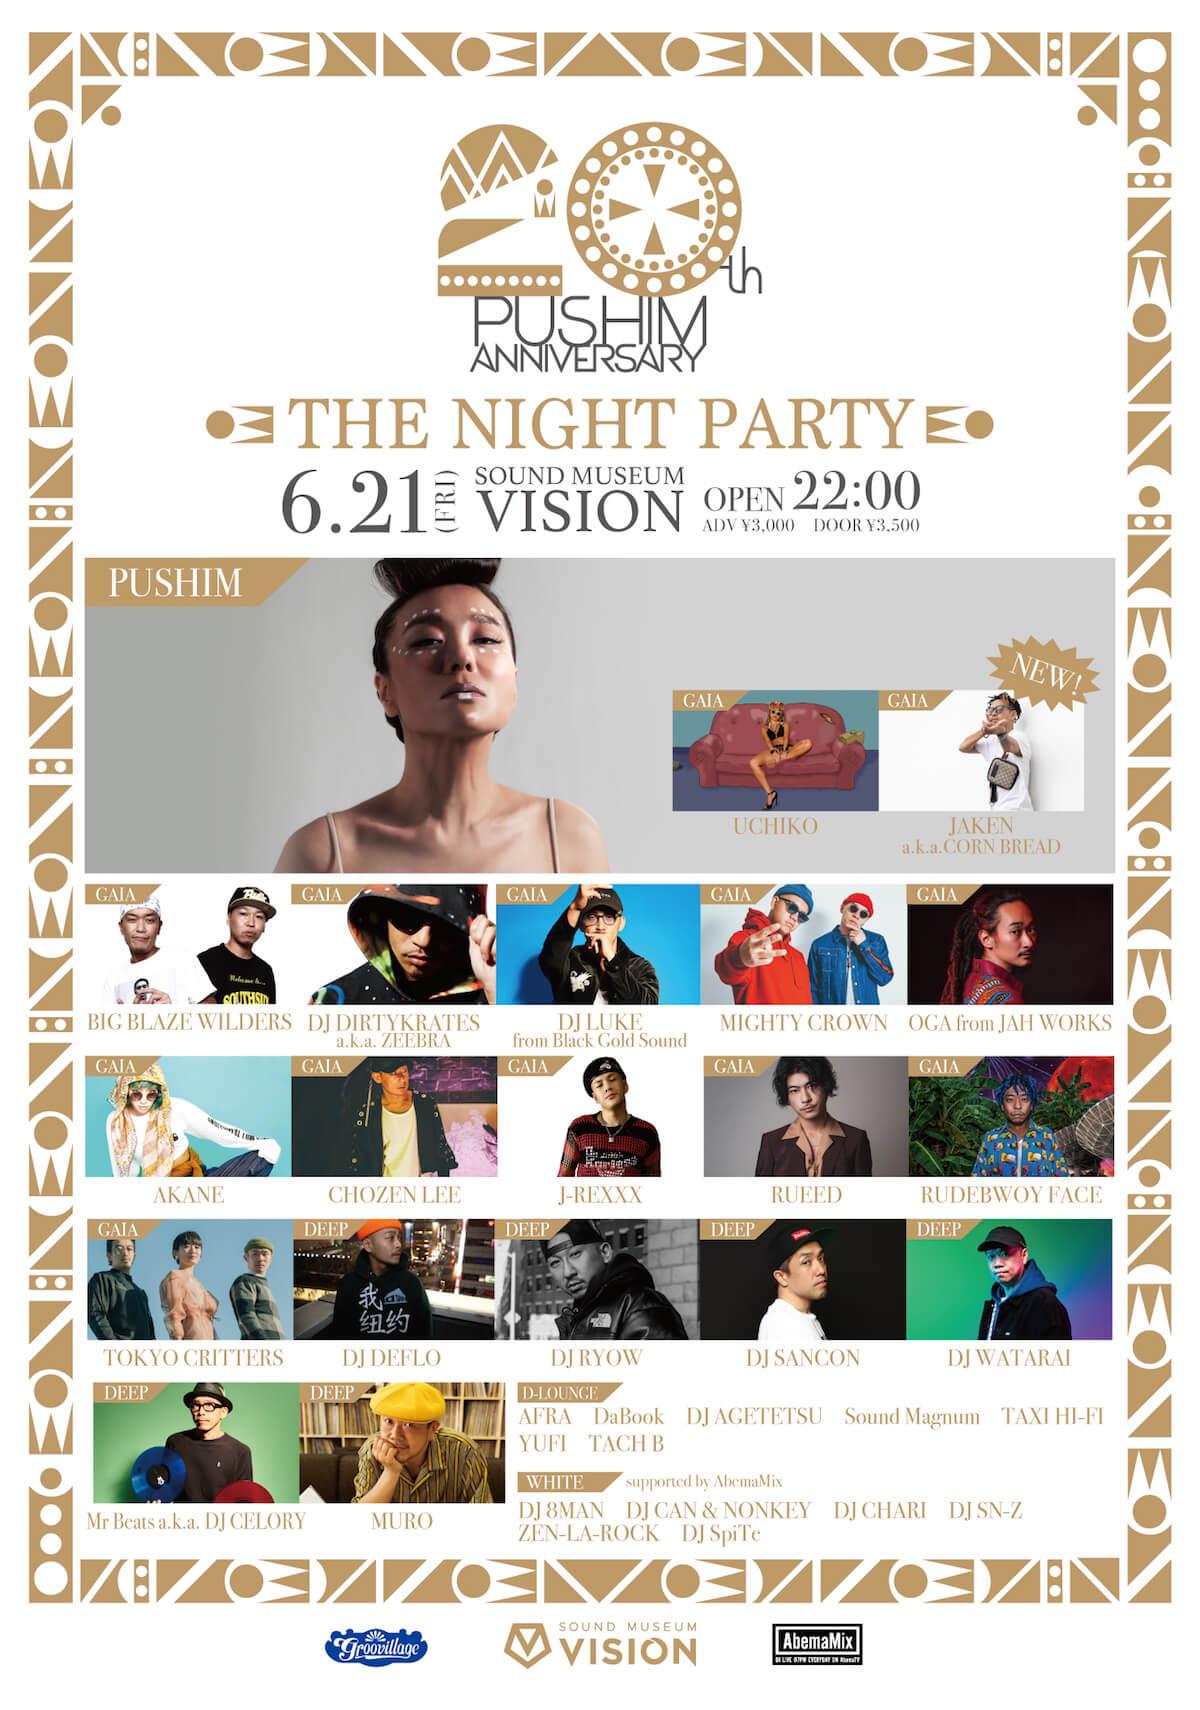 PUSHIMの20周年を記念したナイトパーティーがVISIONにて開催|Mighty Crown、ZEEBRA、MURO、dj Wataraiなどのラインナップ IMG_9890.jpg